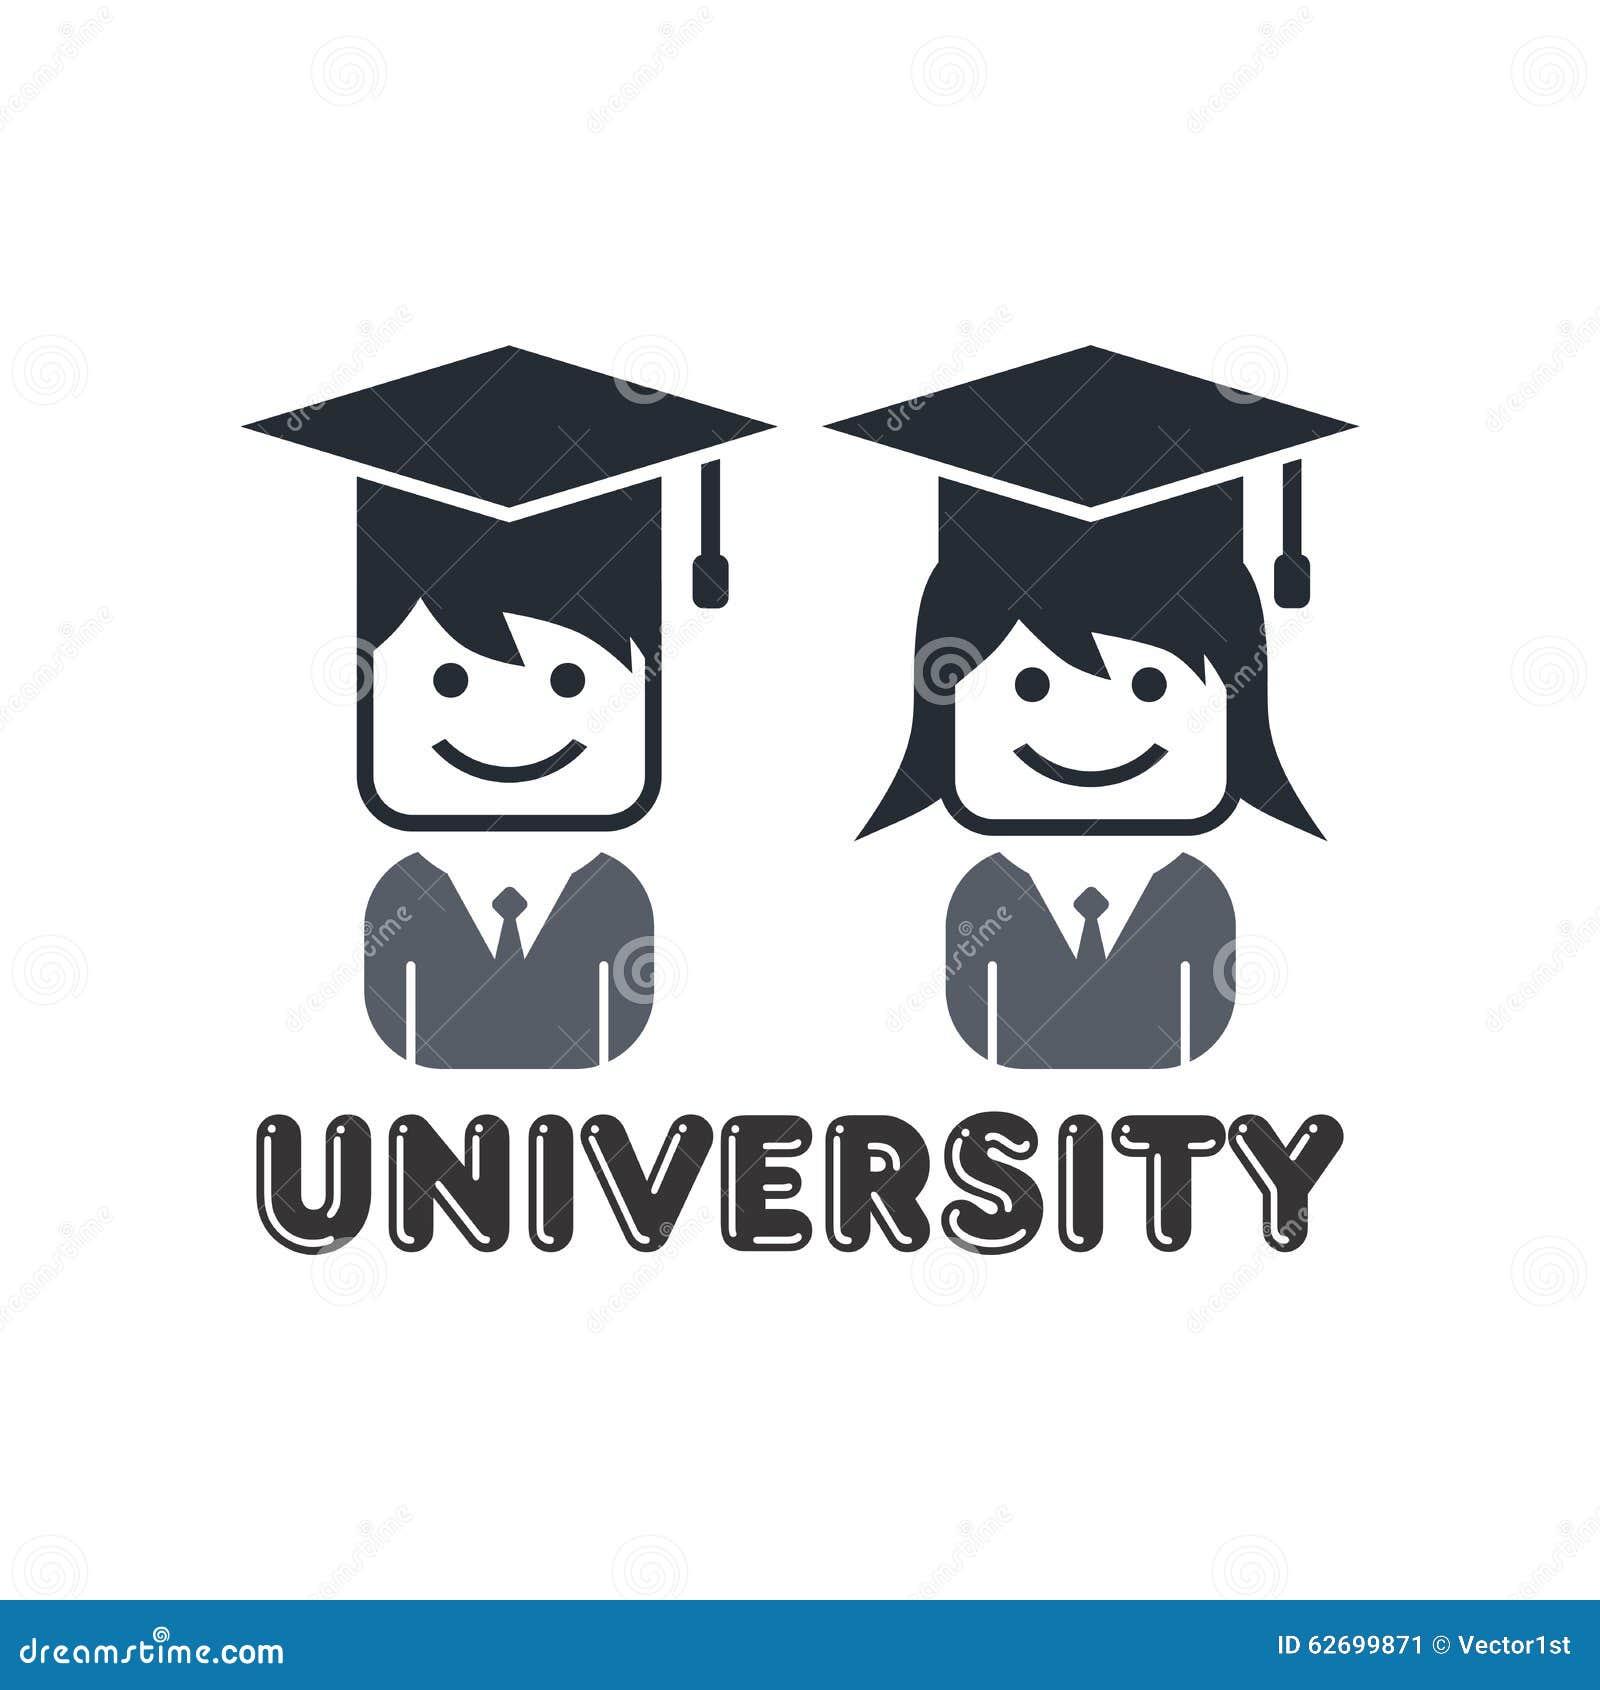 University Student Avatar Stock Vector. Illustration Of